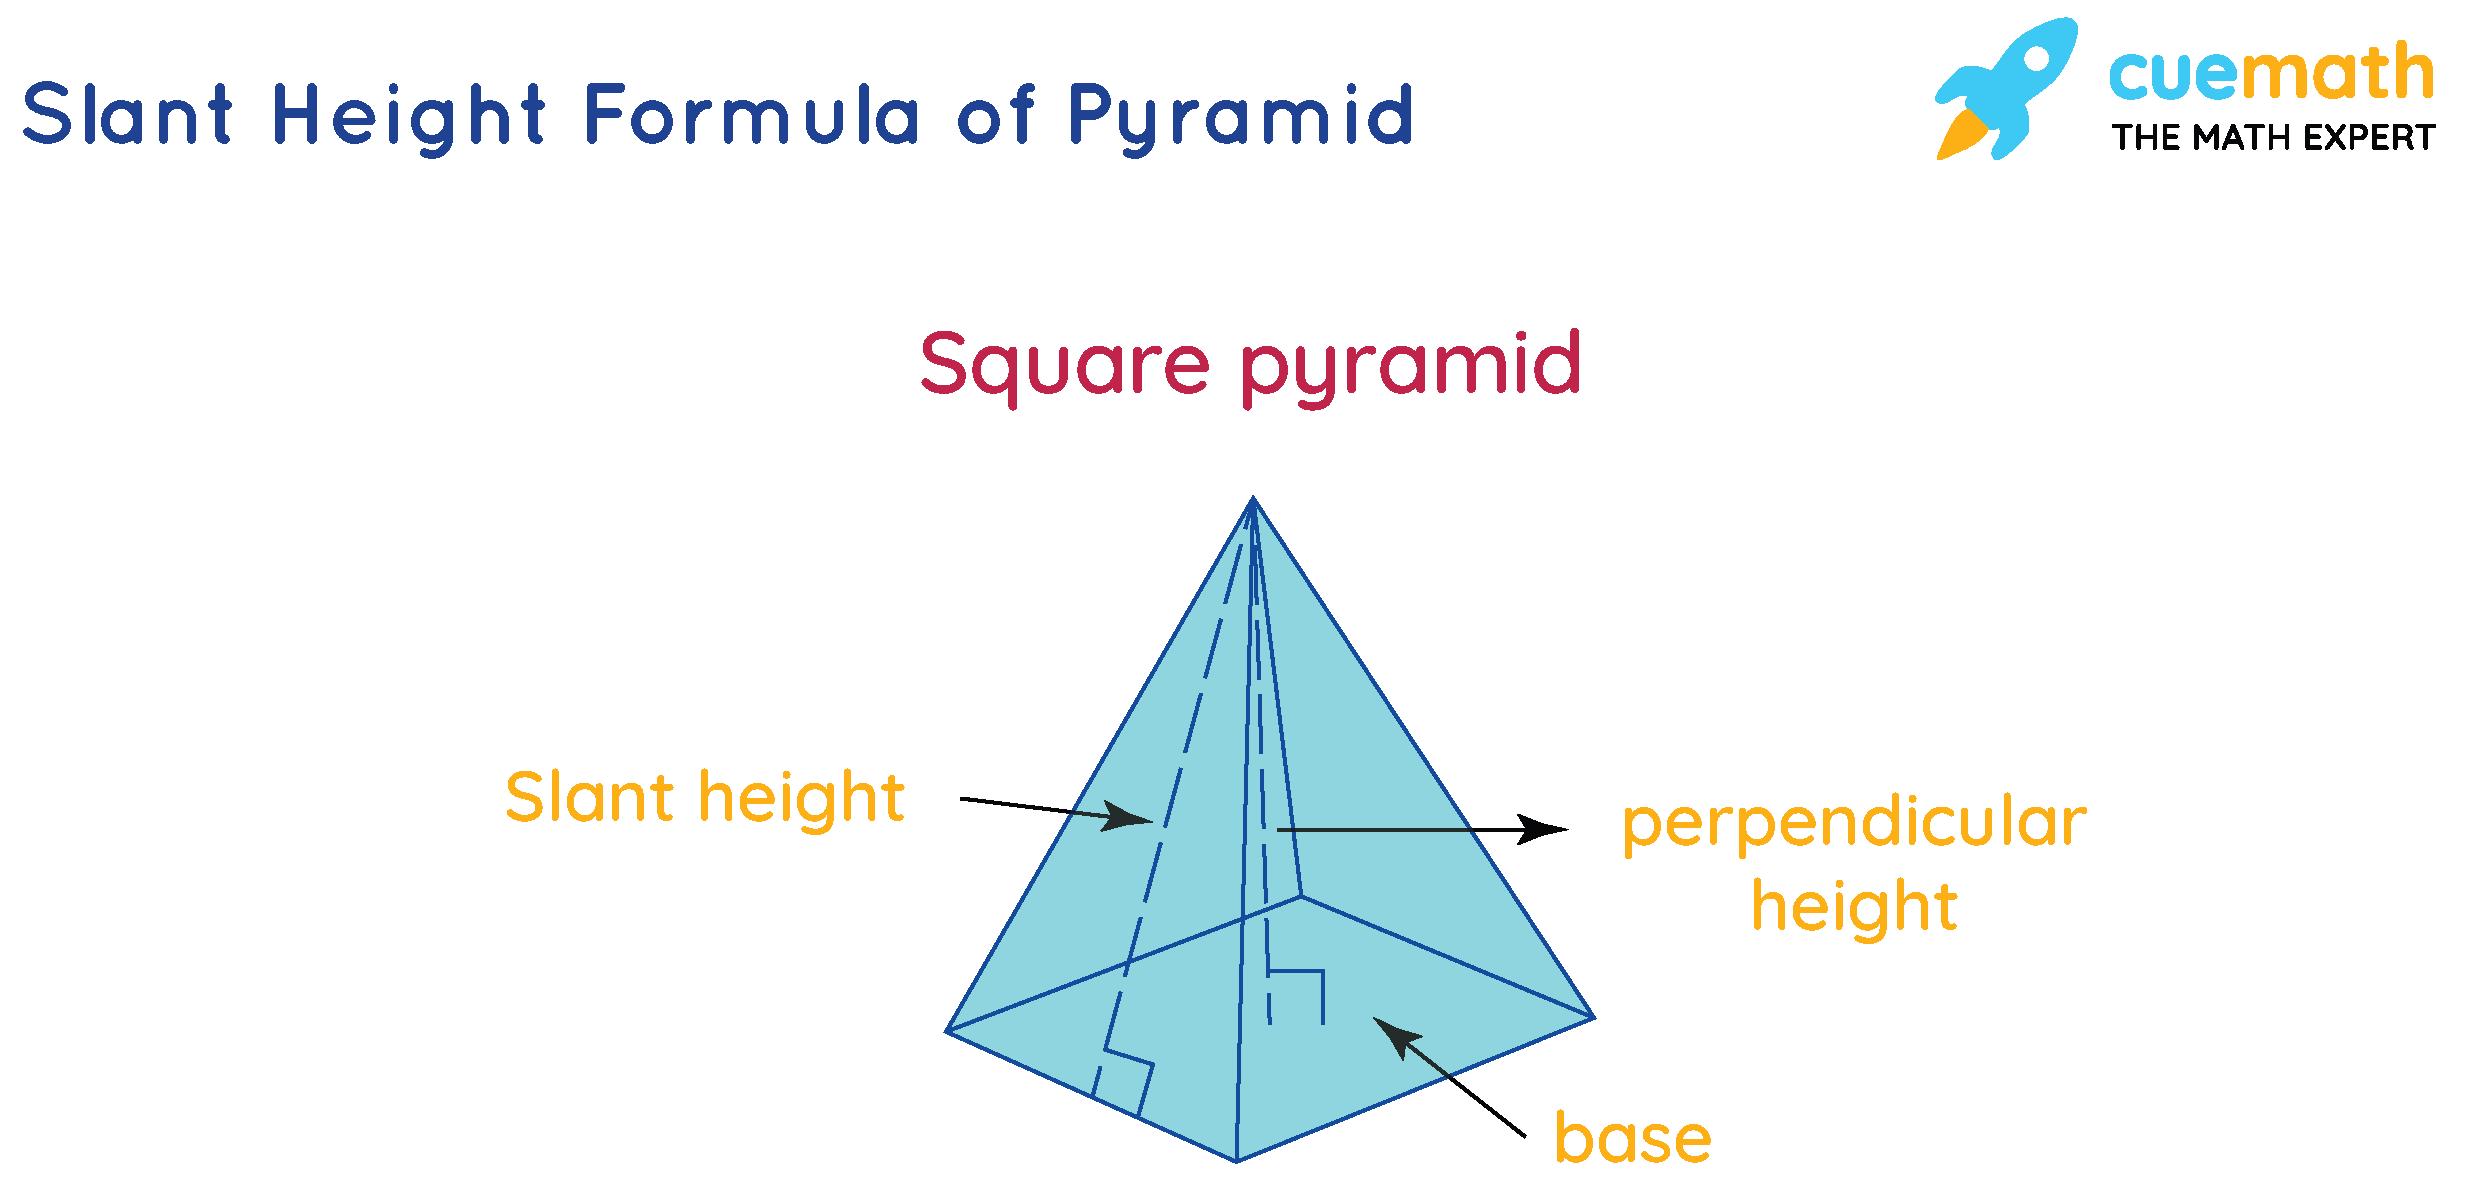 Slant height of Square Pyramid formula